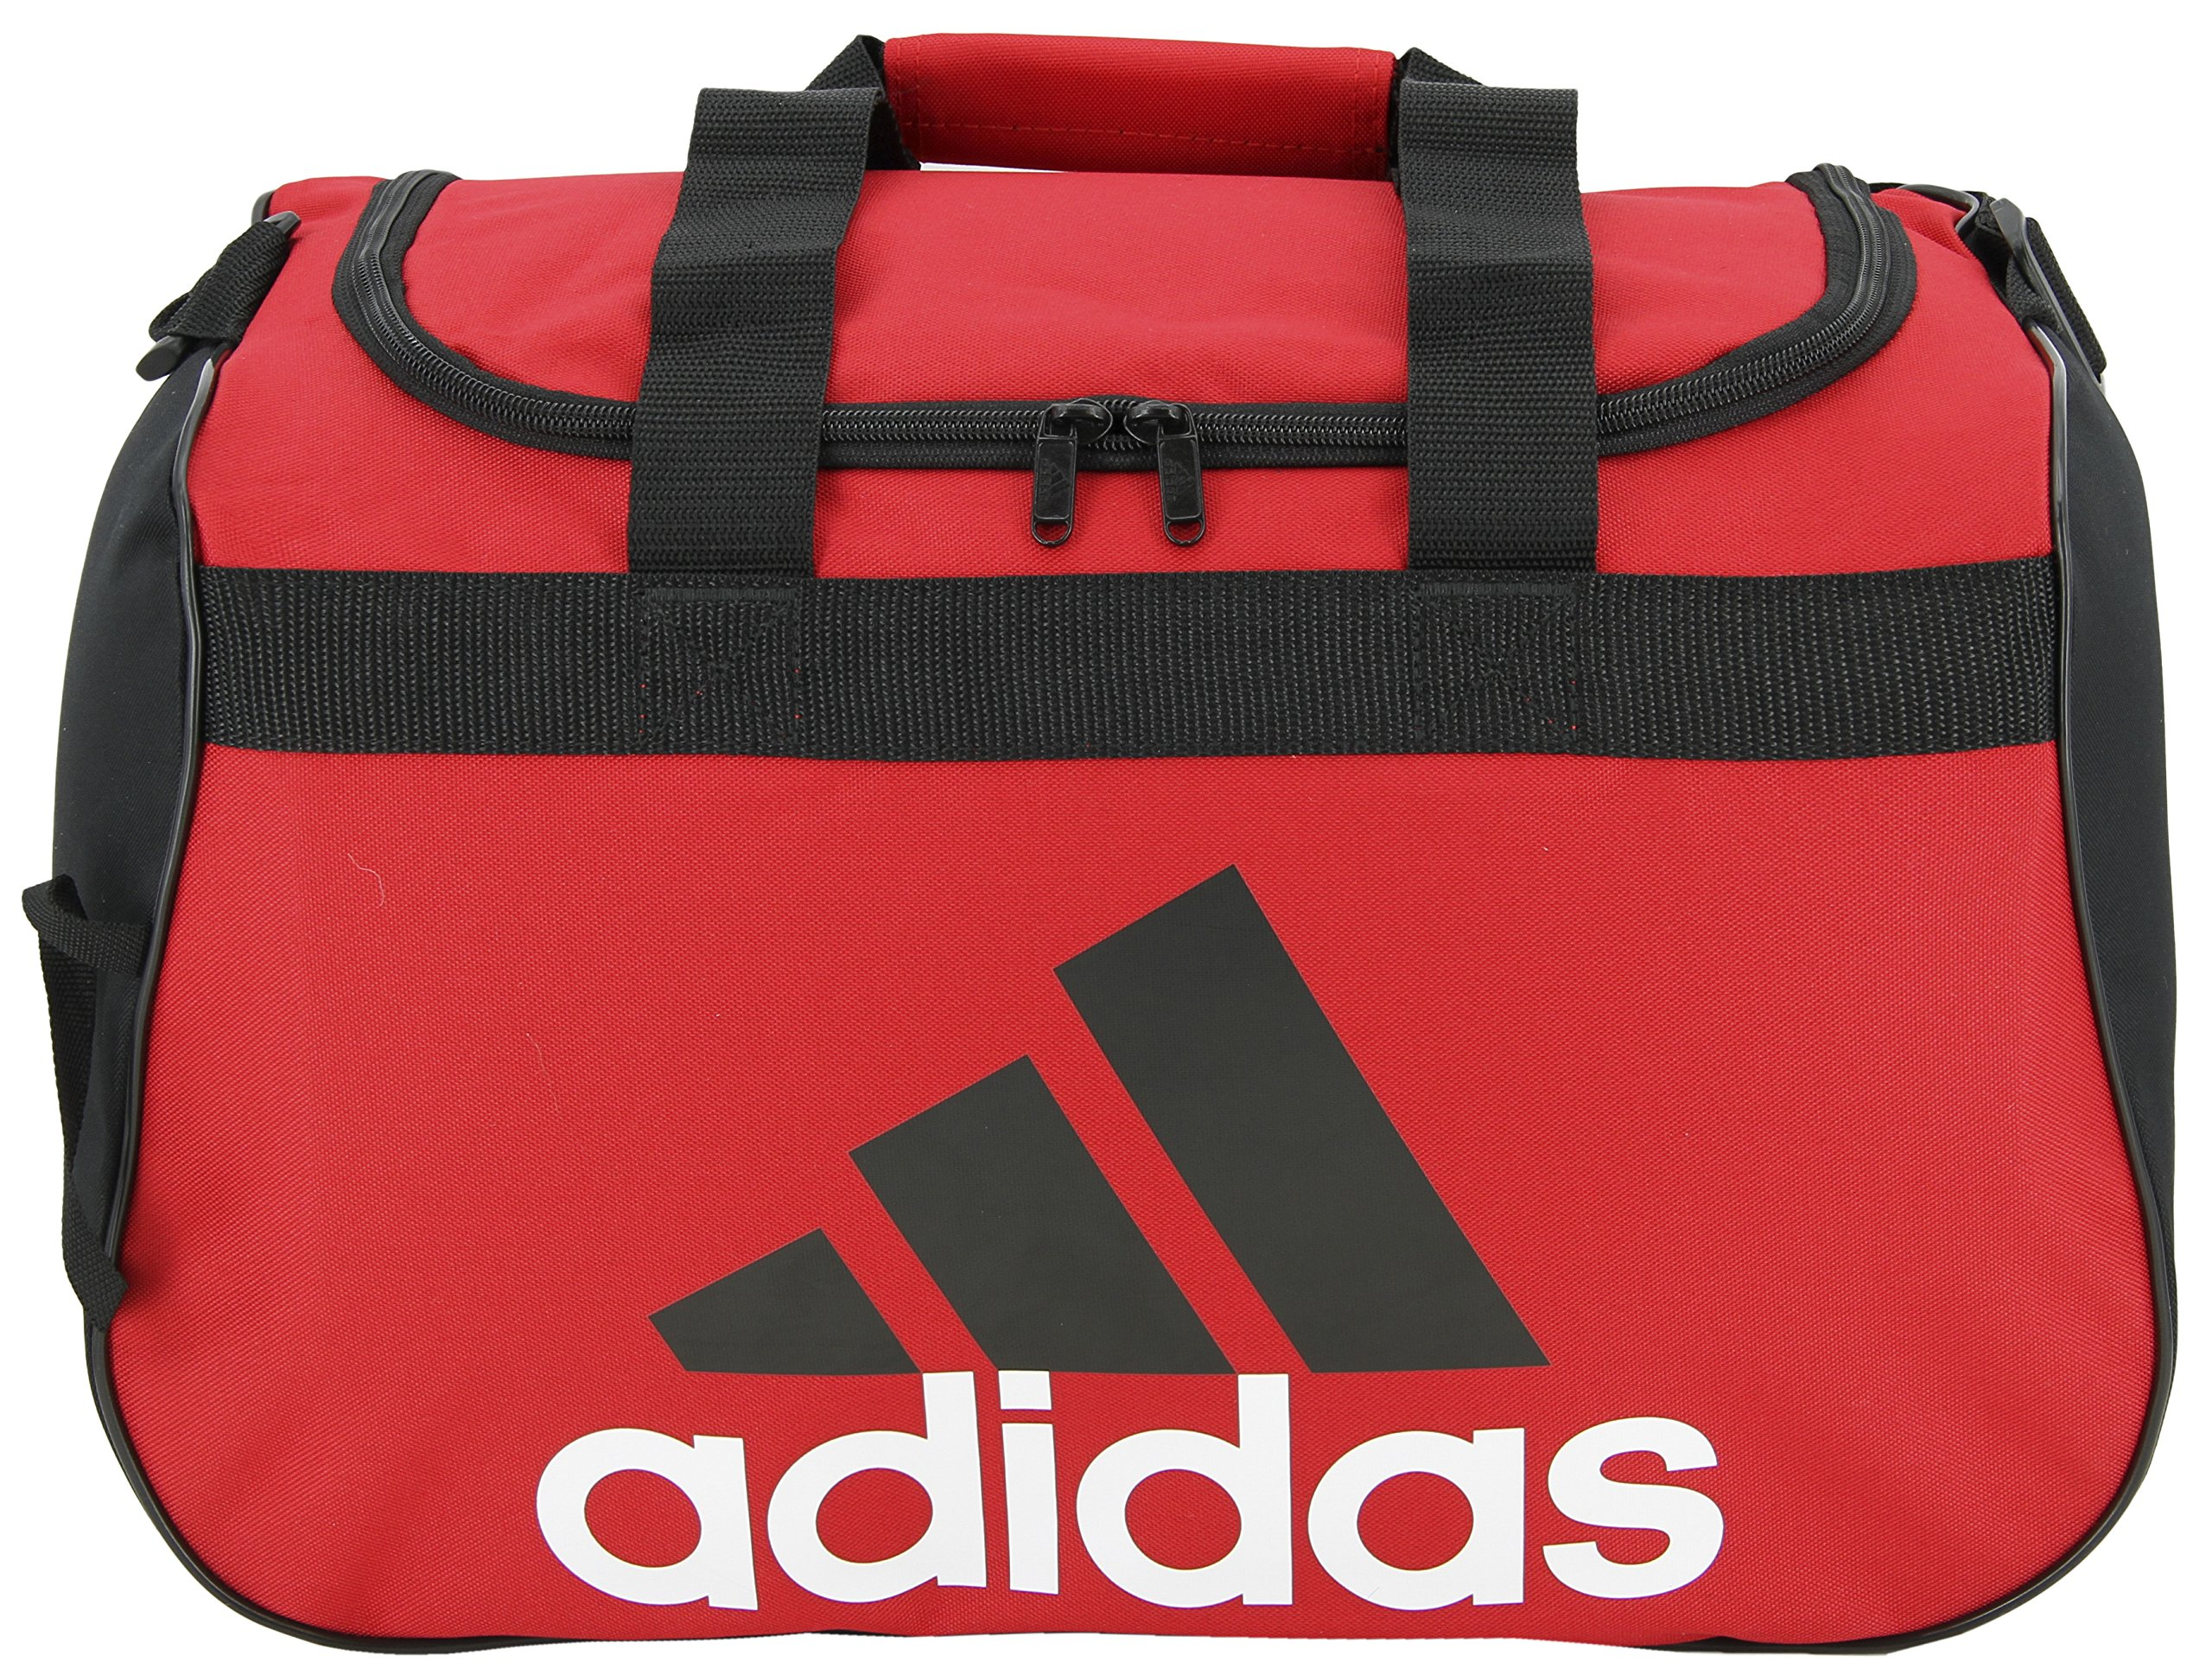 adidas Diablo Small Duffle Bag by